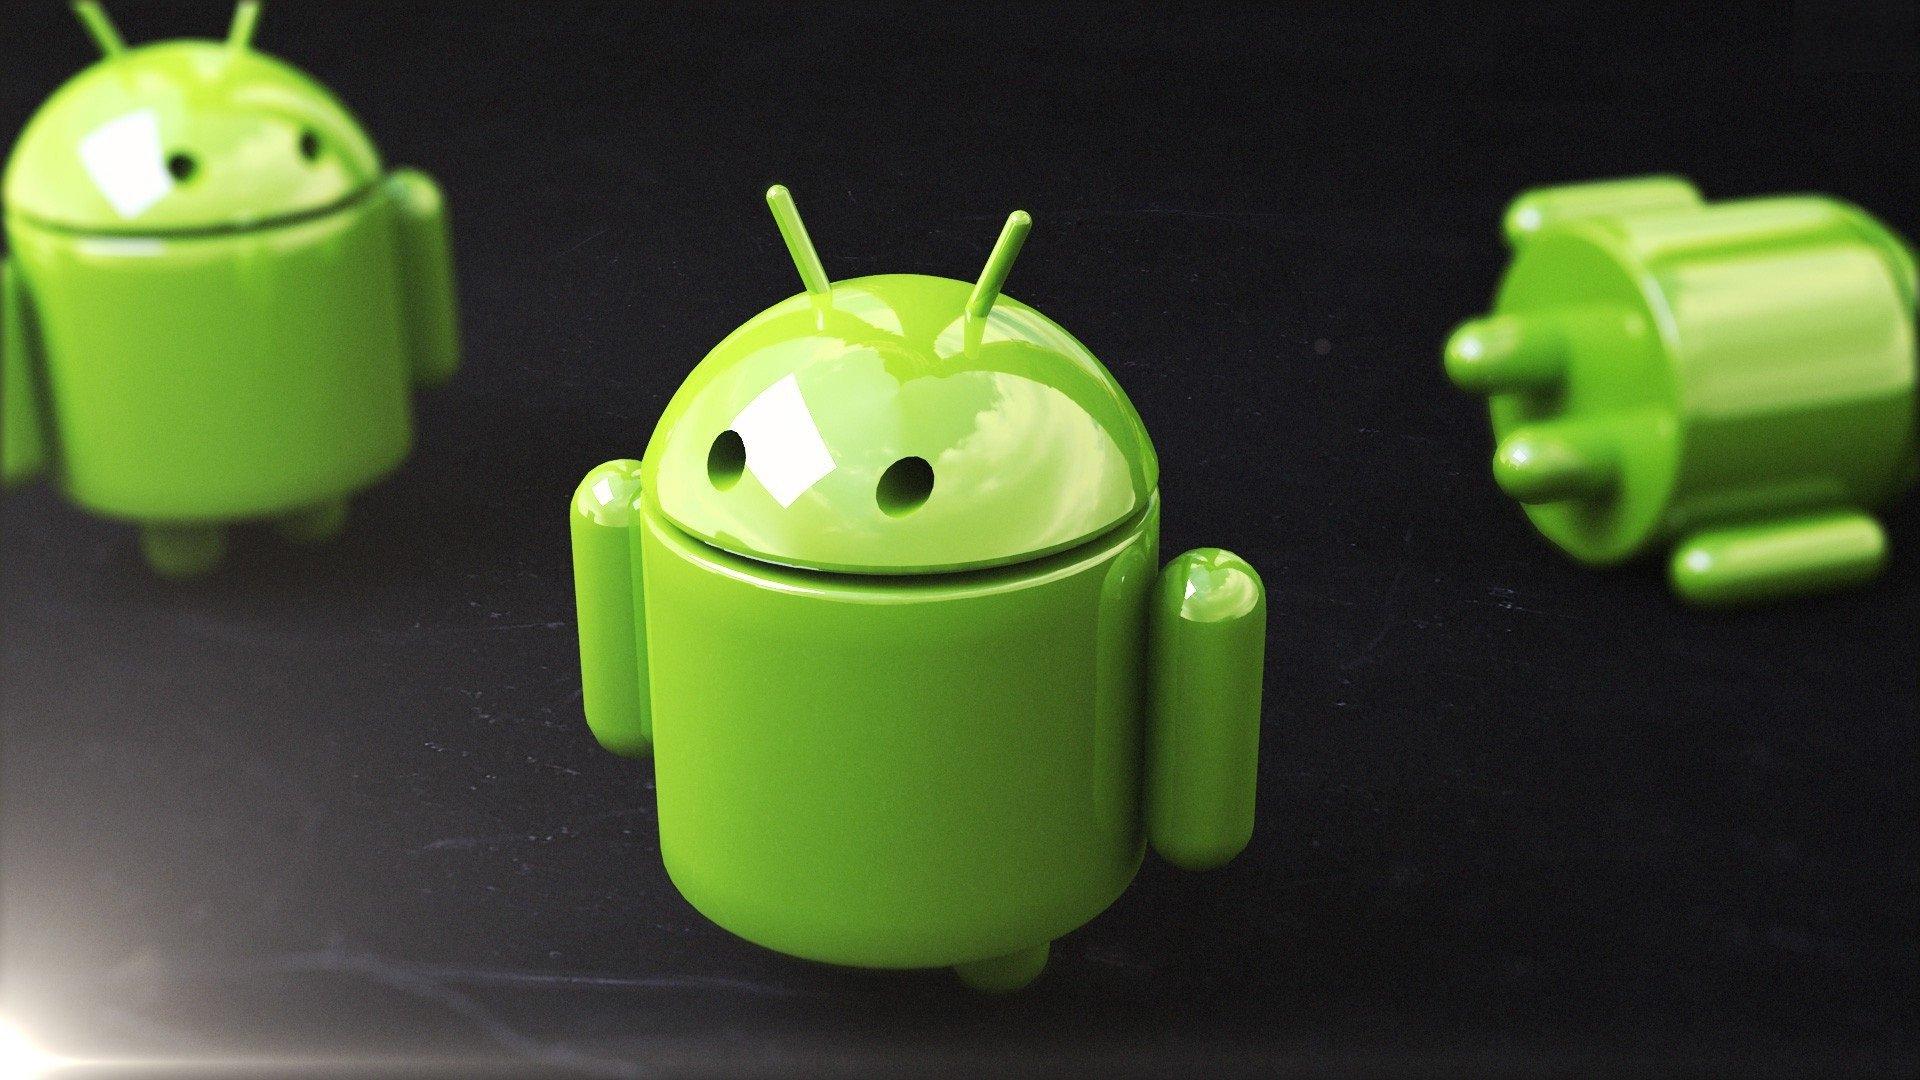 Специалисты пояснили назначение «безопасного режима» на андроид